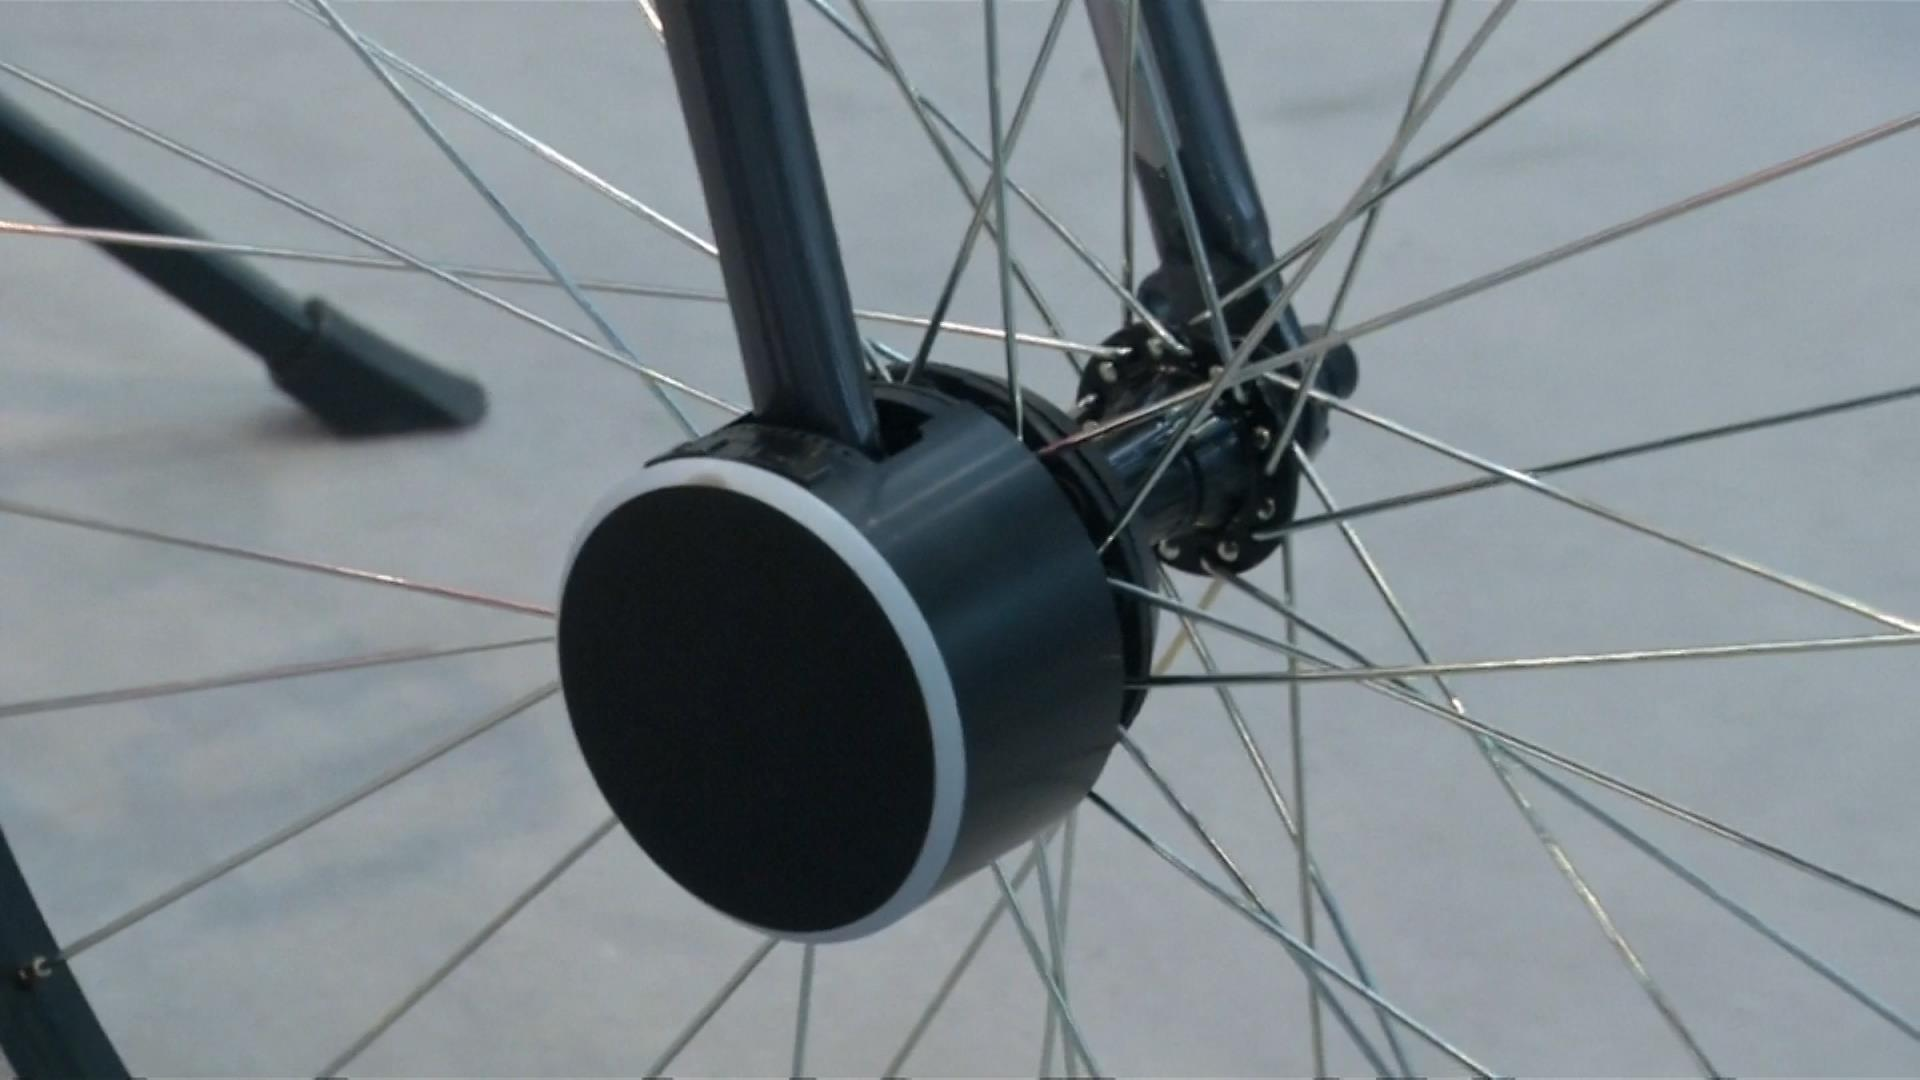 Smart Bike Lock >> Keep Your Bike Secure with this Smart Bike Lock - NBC News